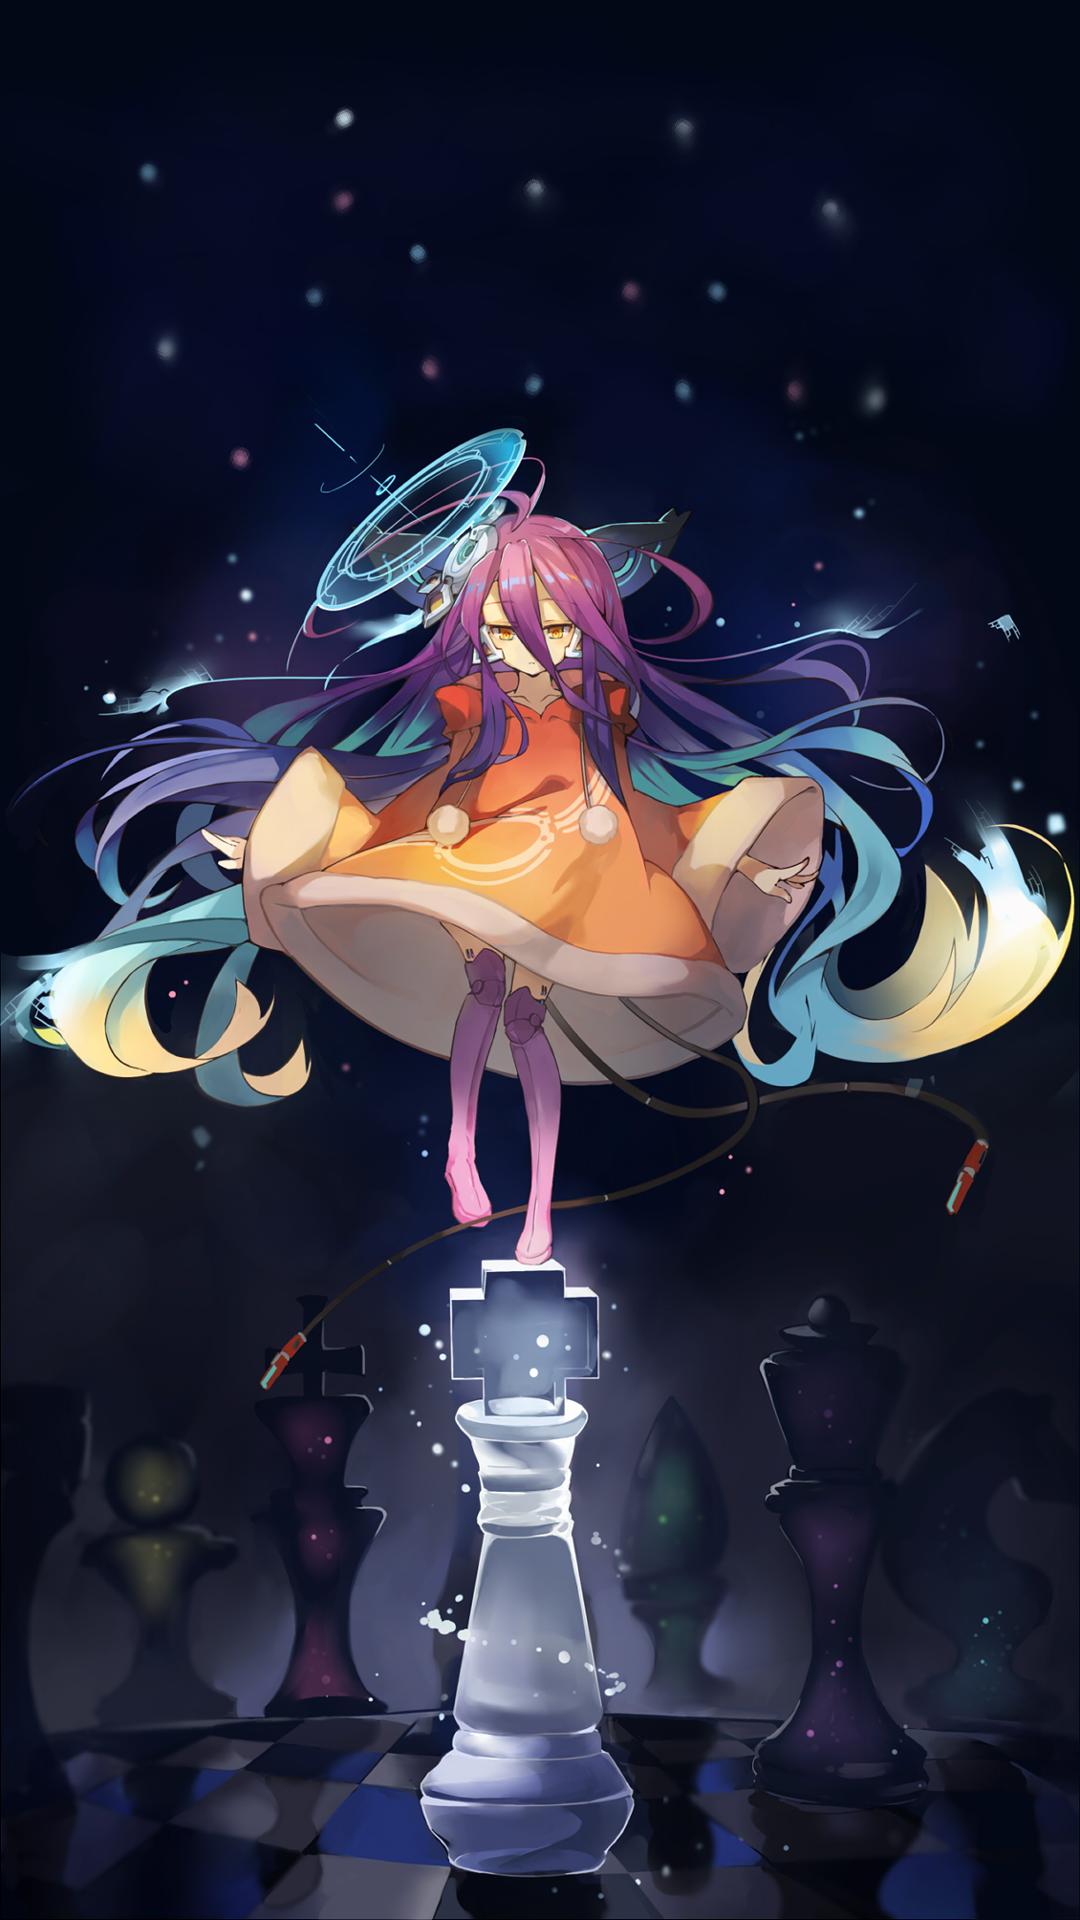 Anime 1080x1920 anime anime girls No Game No Life chess stars machine vertical